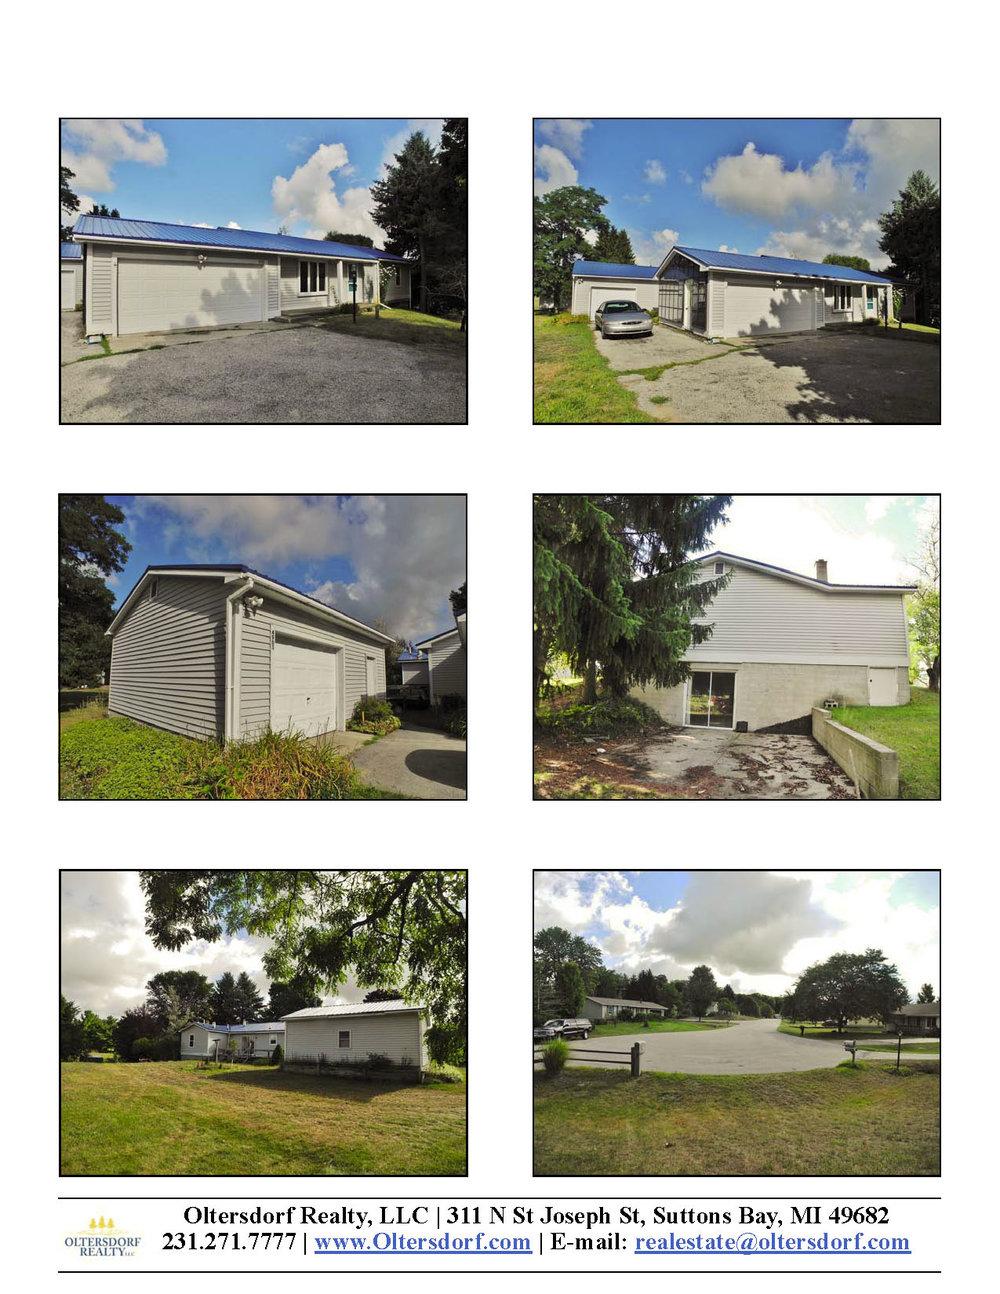 4903 Waldon Circle, Traverse City, MI – 3 Bedroom & 2 Bath Ranch Home for sale by Oltersdorf Realty LLC marketing packet (2).jpg